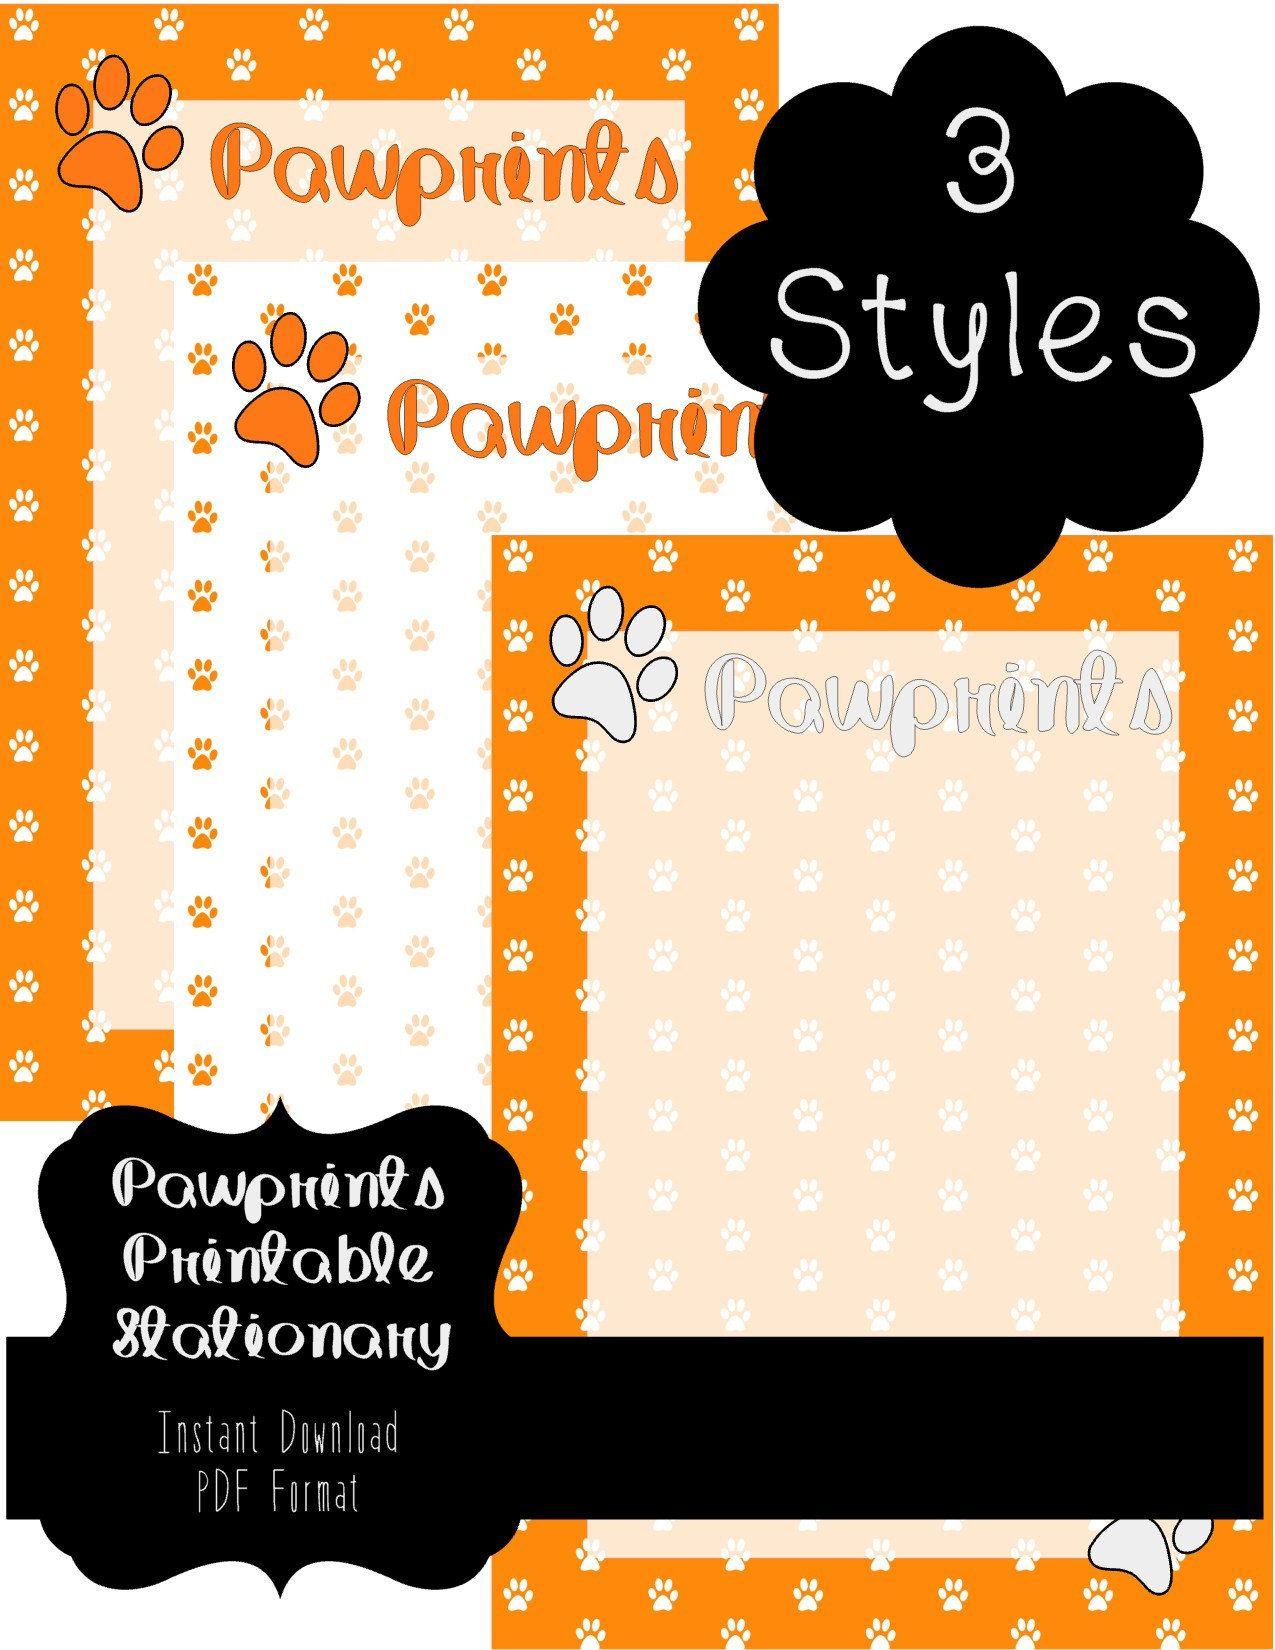 Pawprints In Orange